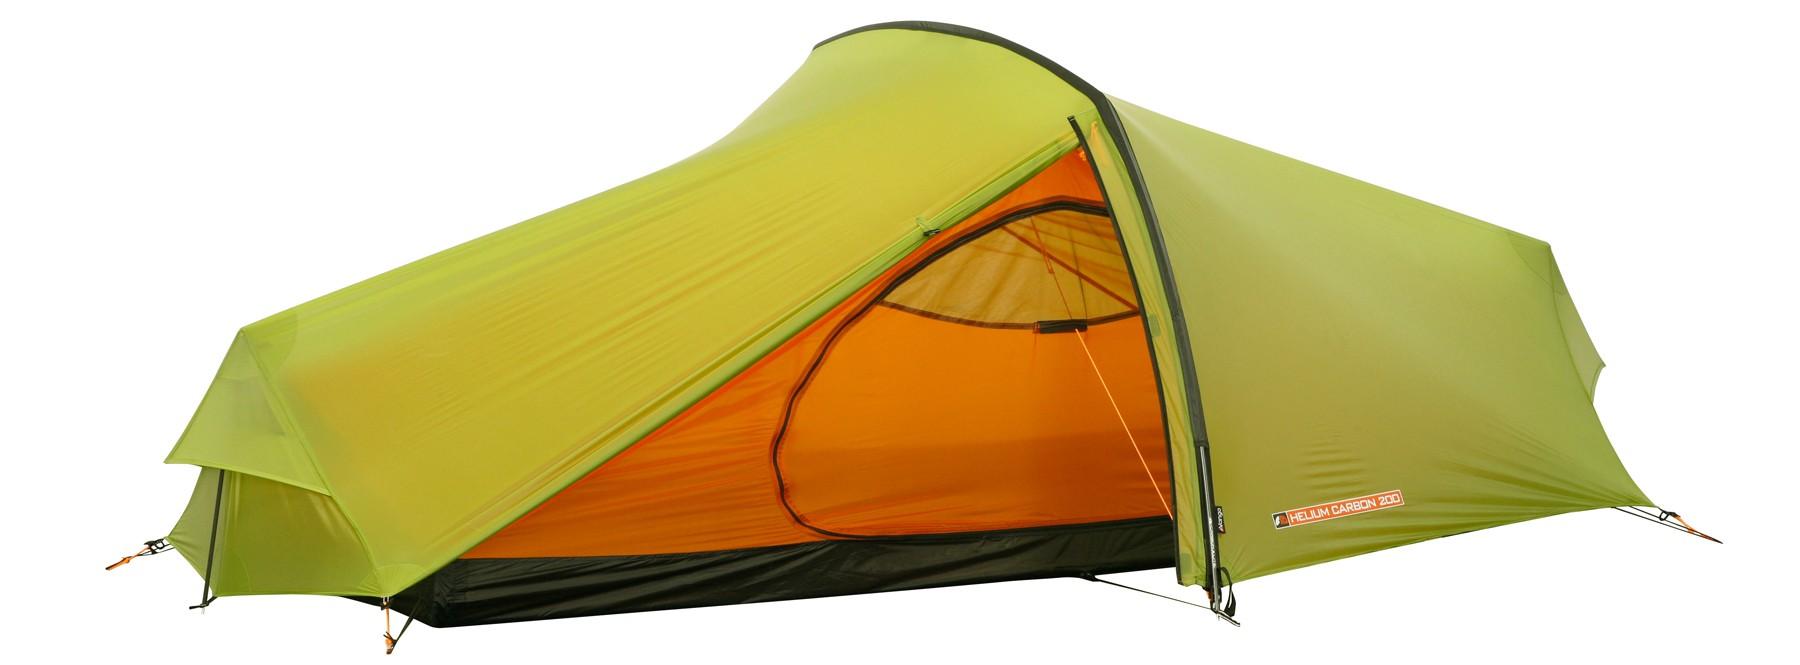 sc 1 st  Outdoor Megastore & Force Ten Helium Carbon 200 Tent